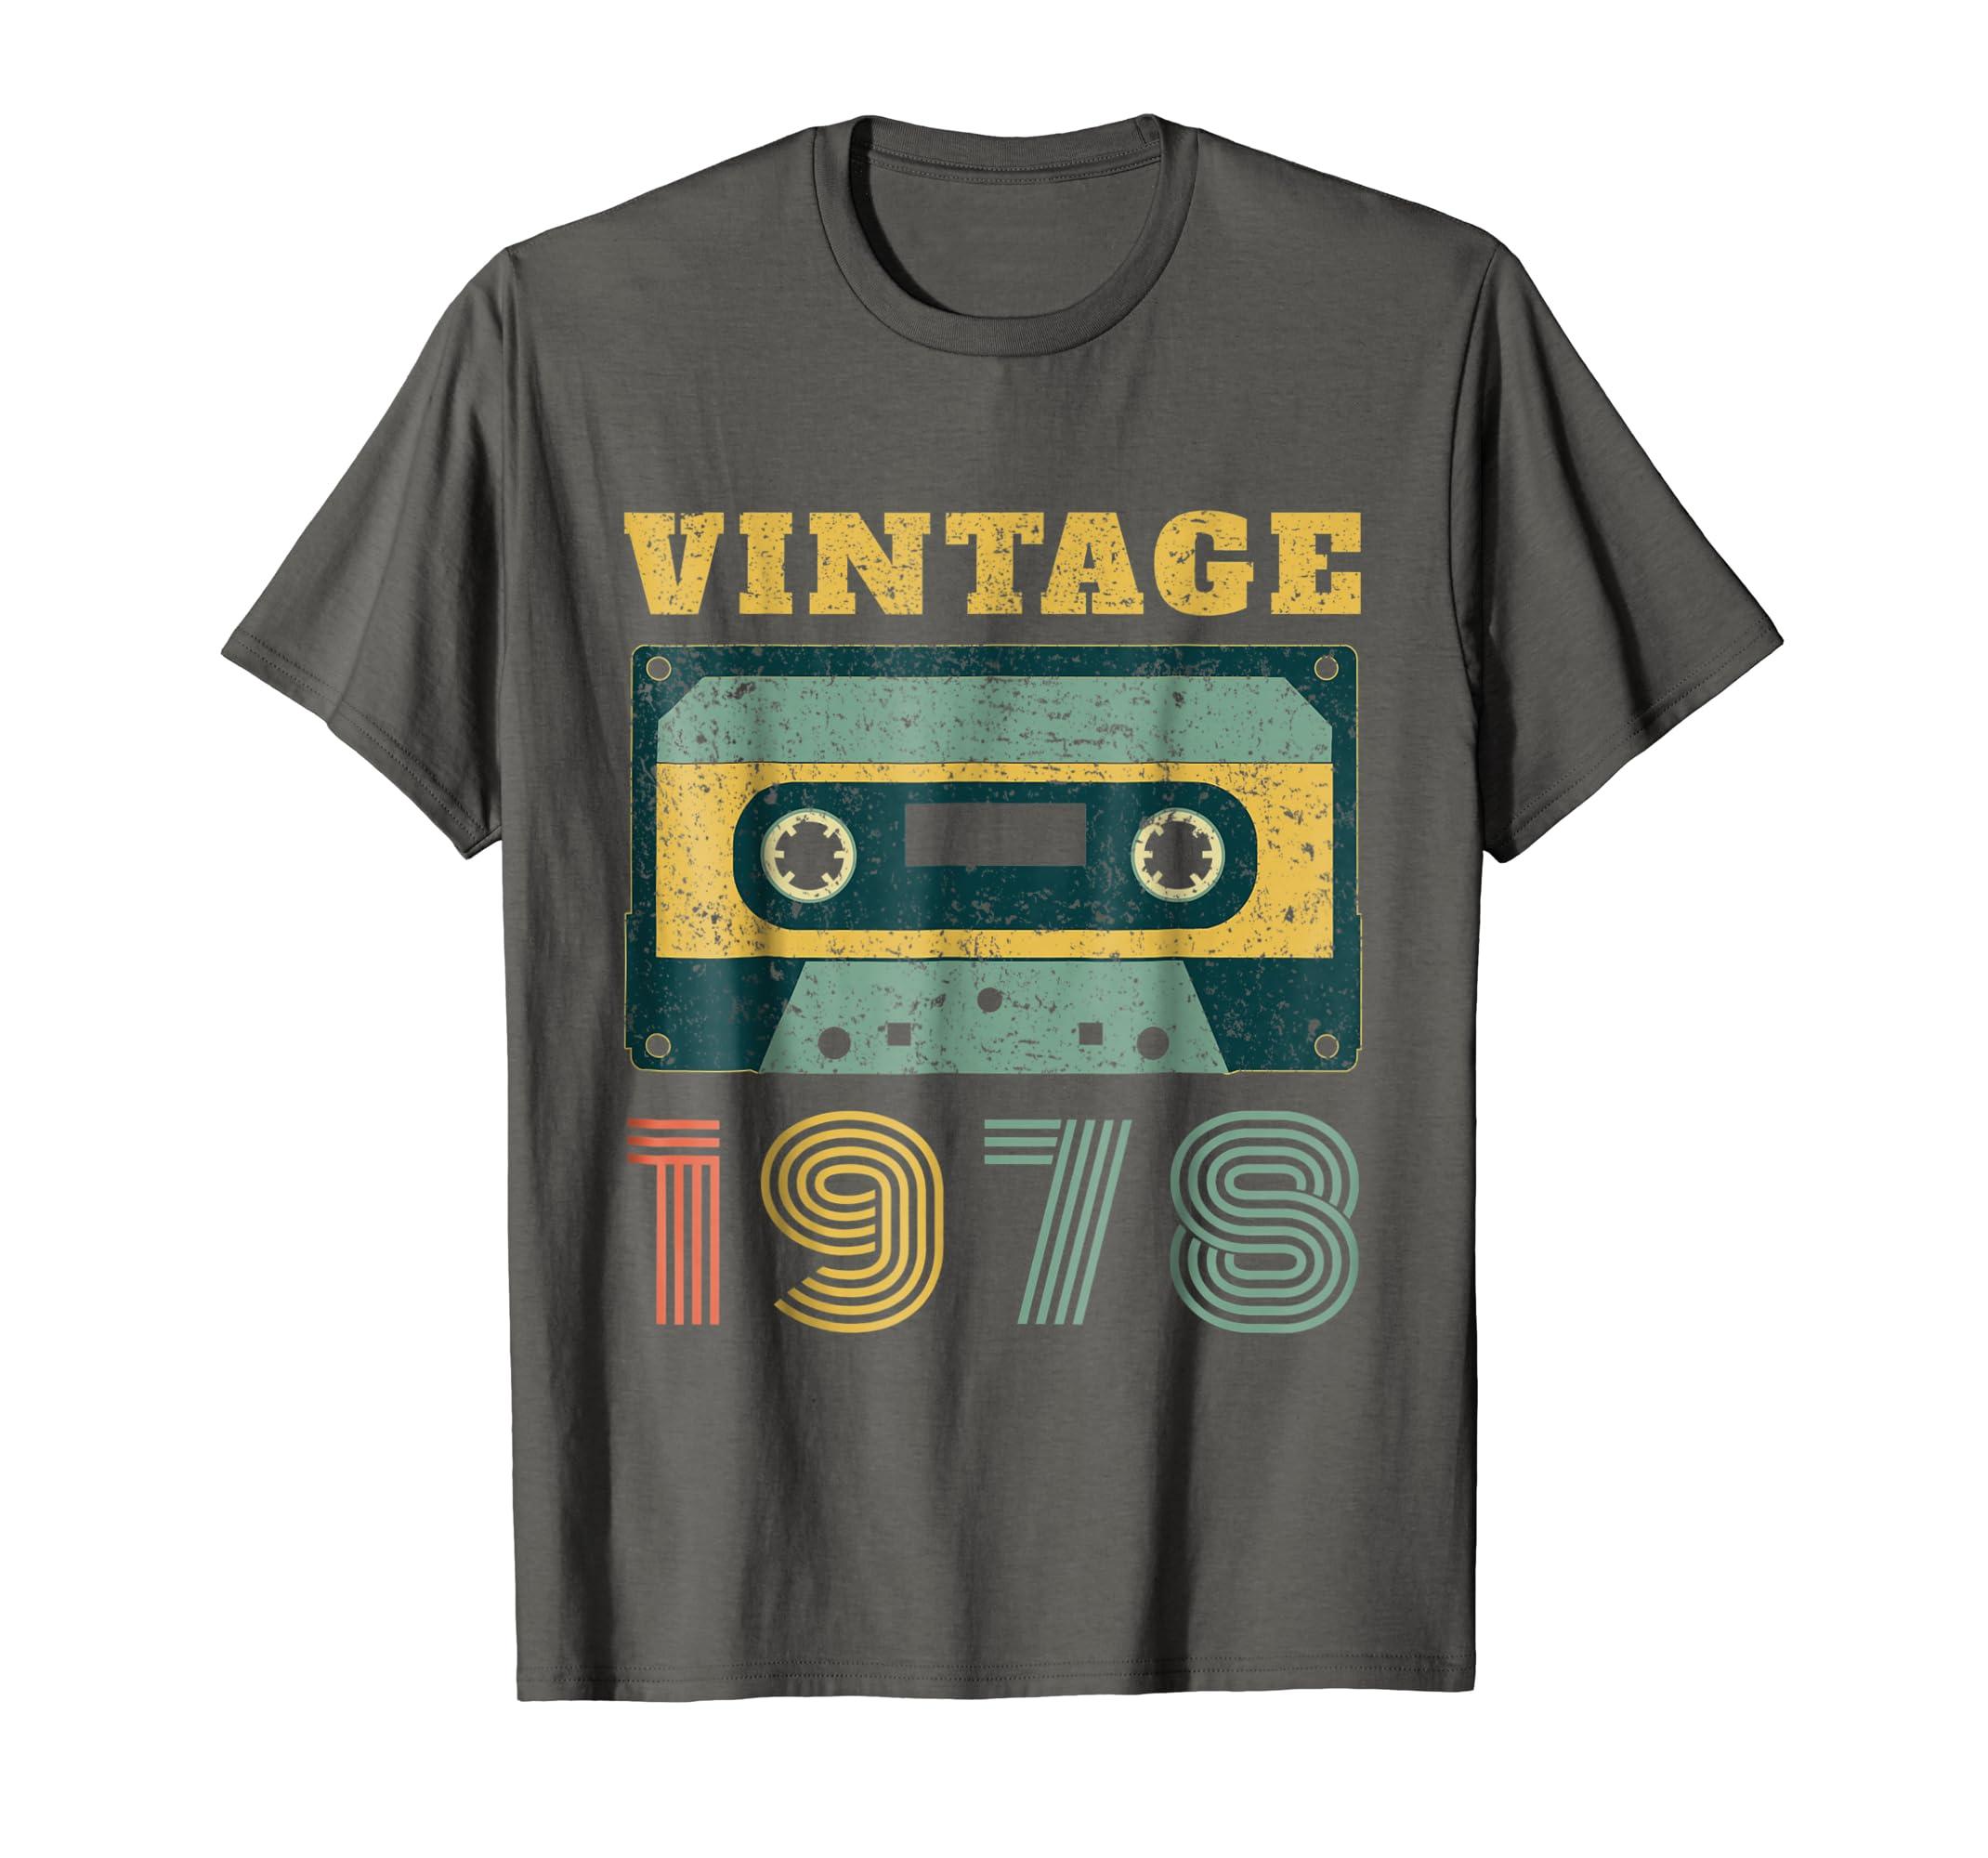 cbff25d29ed872 40th Birthday Gift Vintage 1978 Year Old Mixtape T-Shirt-Rose ...